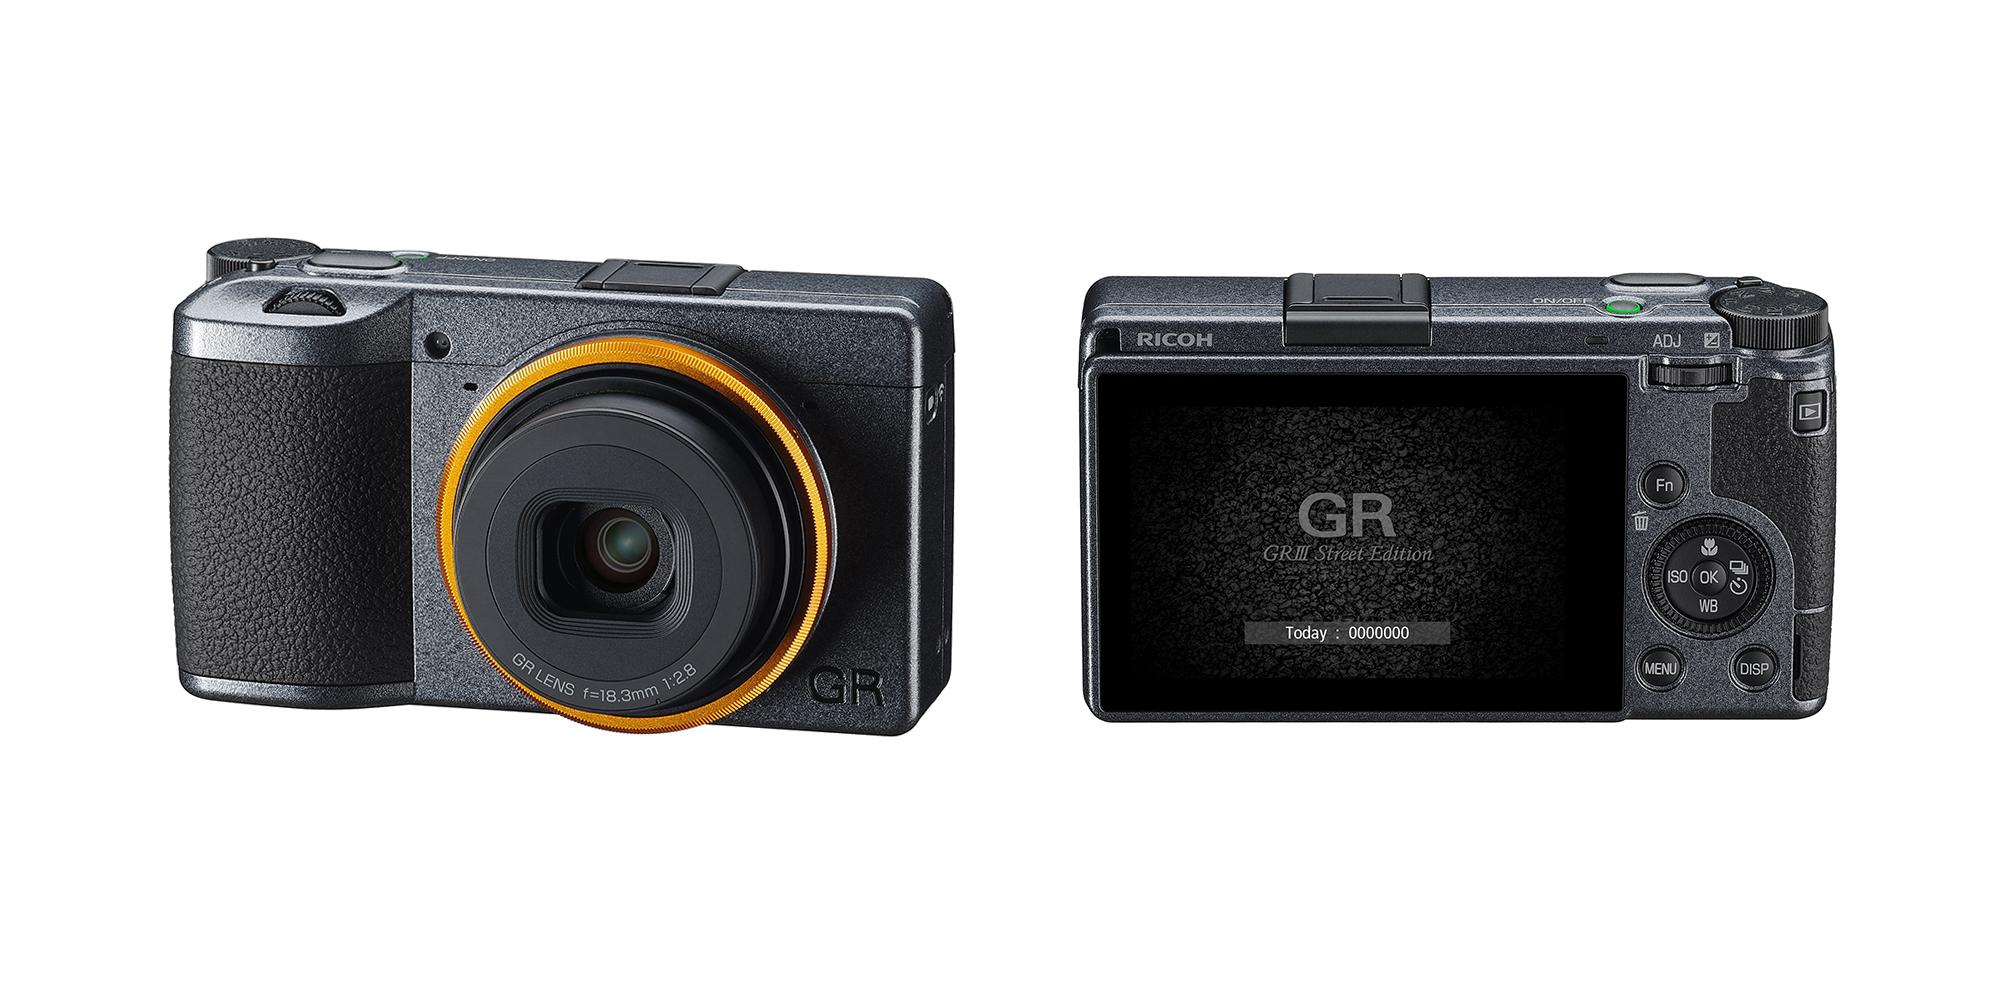 RICOH เปิดตัวกล้อง RICOH GR III Street Edition